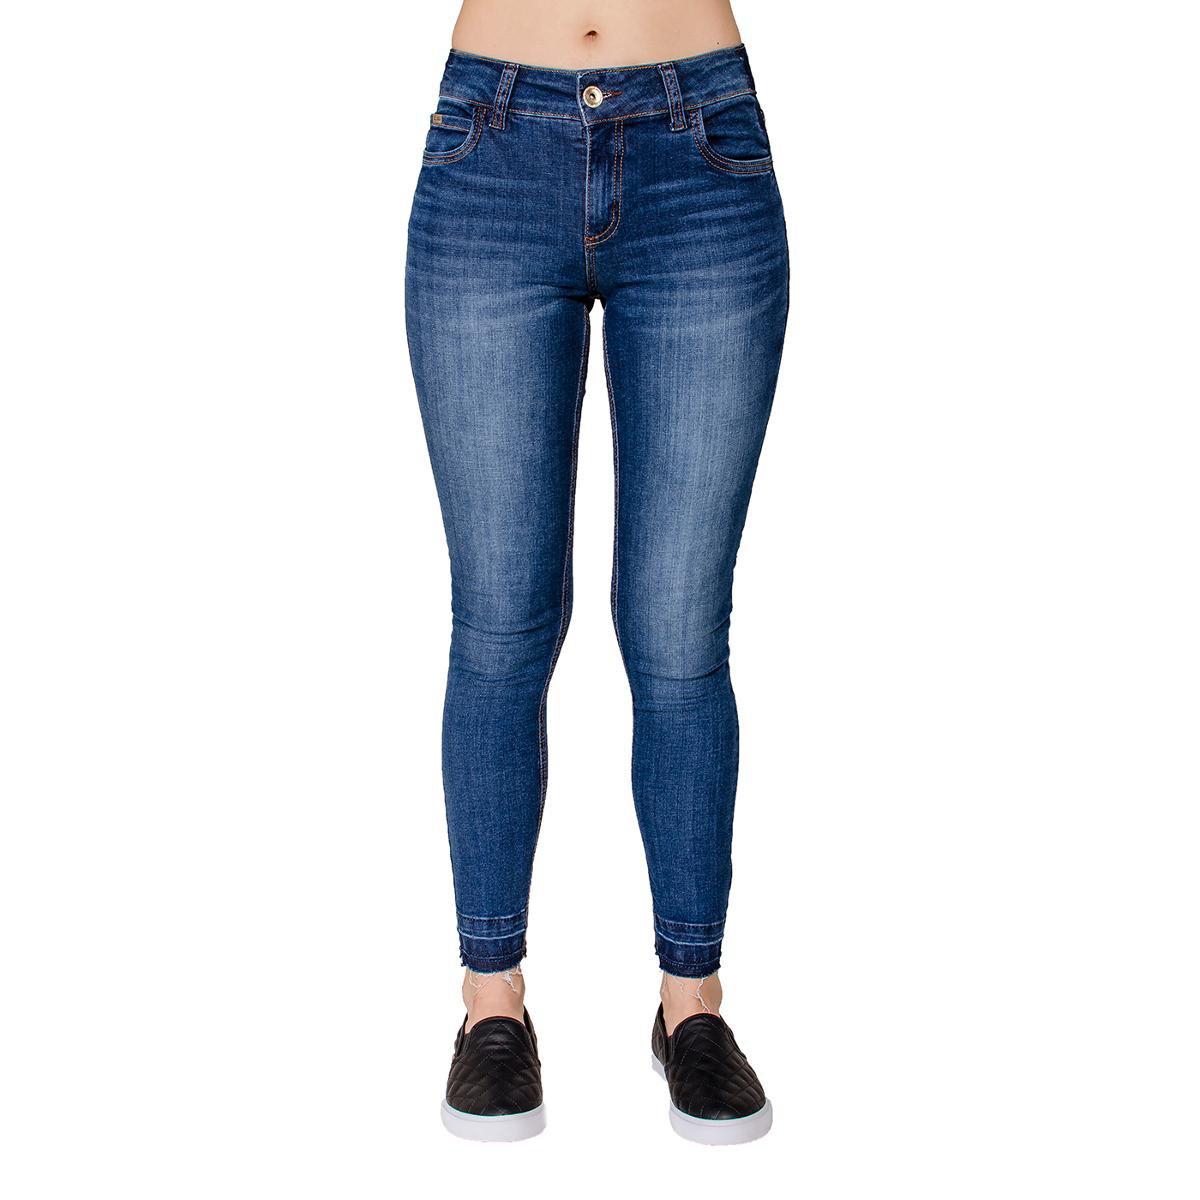 a76730251 Calça Jeans Skinny Fátima Barra Desfeita Colcci - Azul - Compre Agora |  Zattini